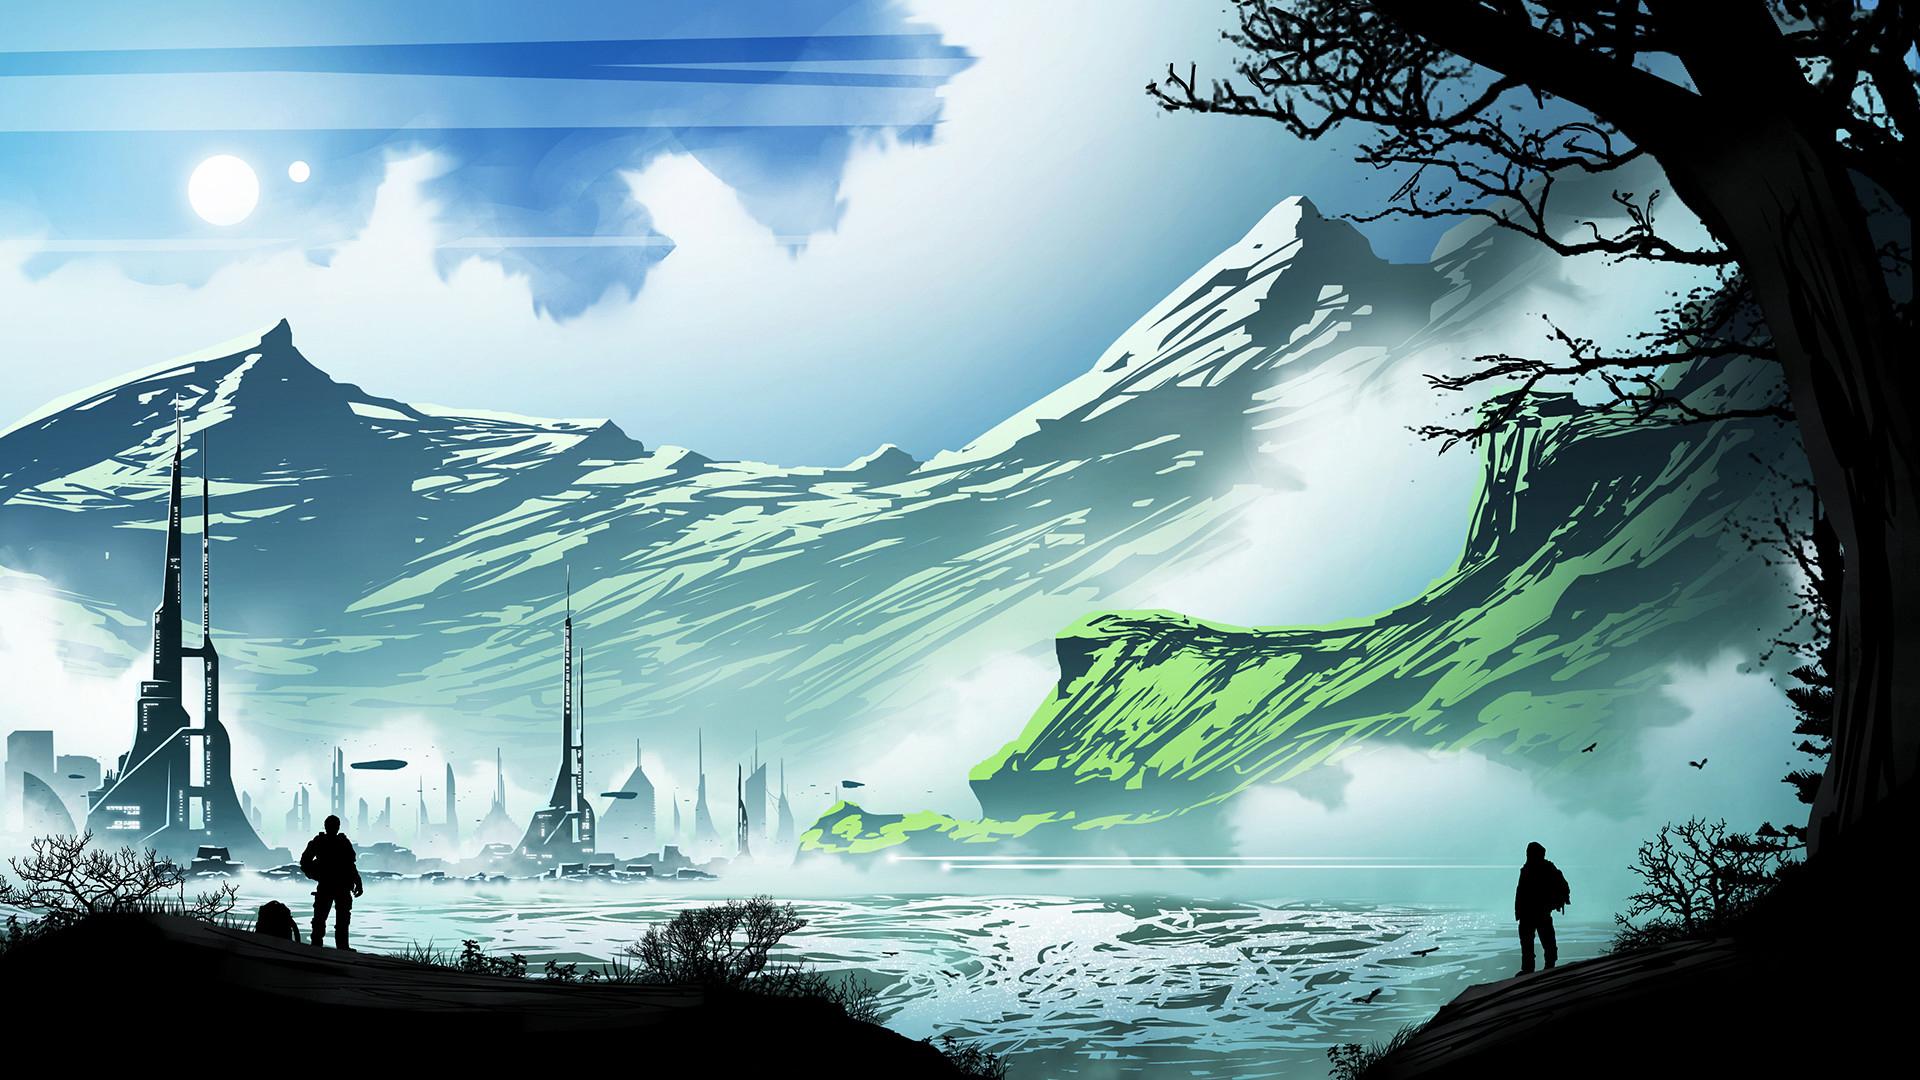 Sci Fi Landscape 1920x1080